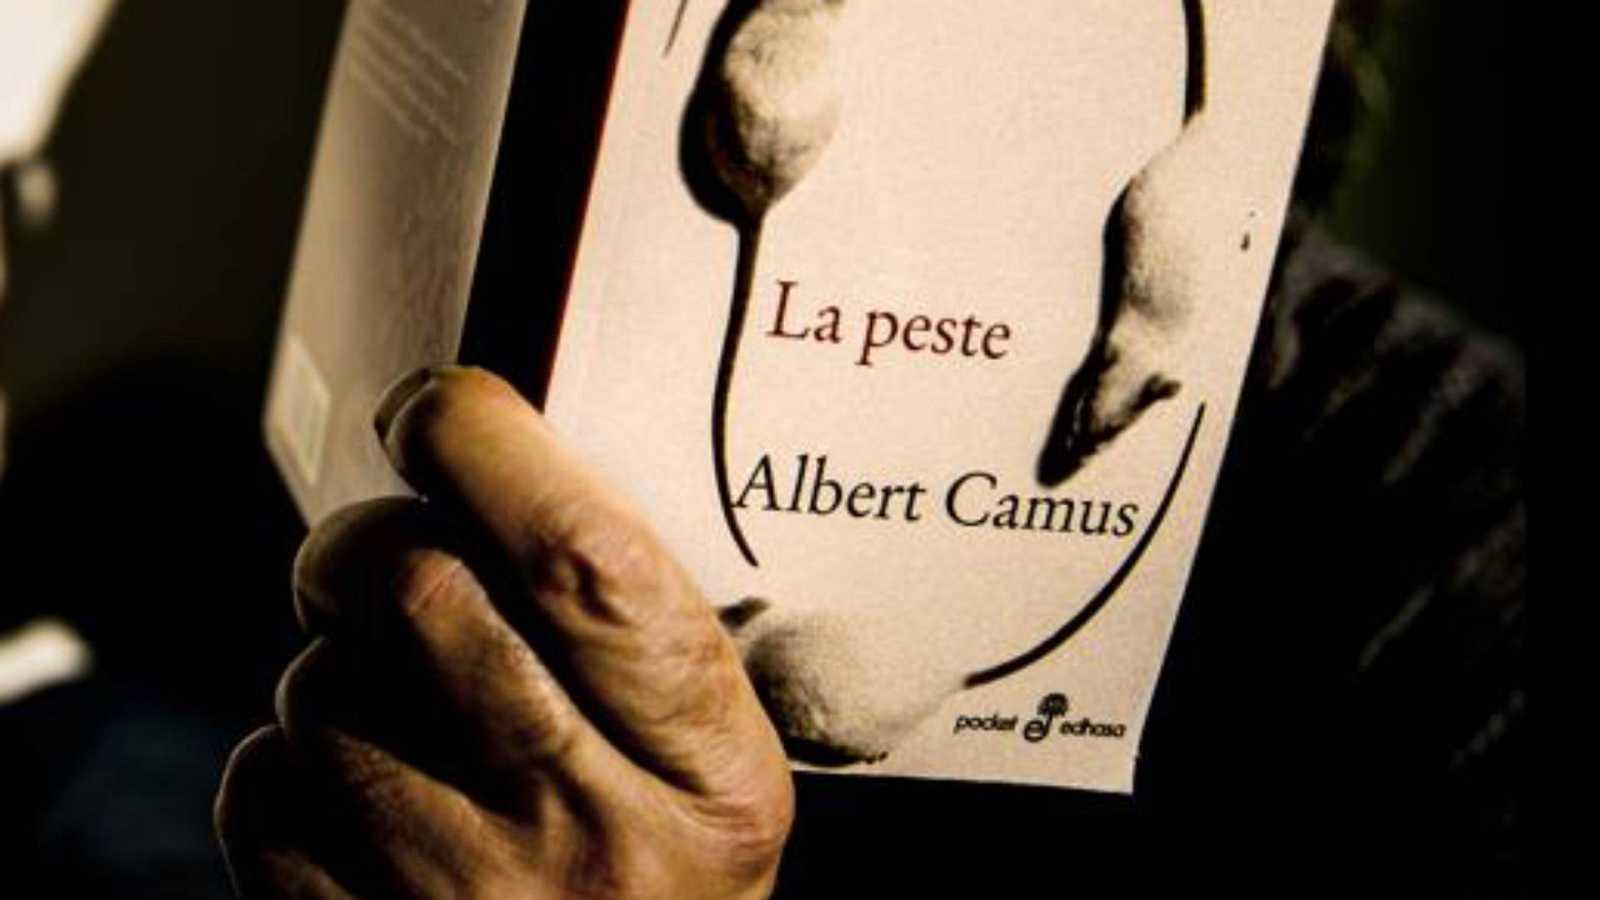 Documentos RNE - Albert Camus: un hombre solo - 09/03/13 - escuchar ahora